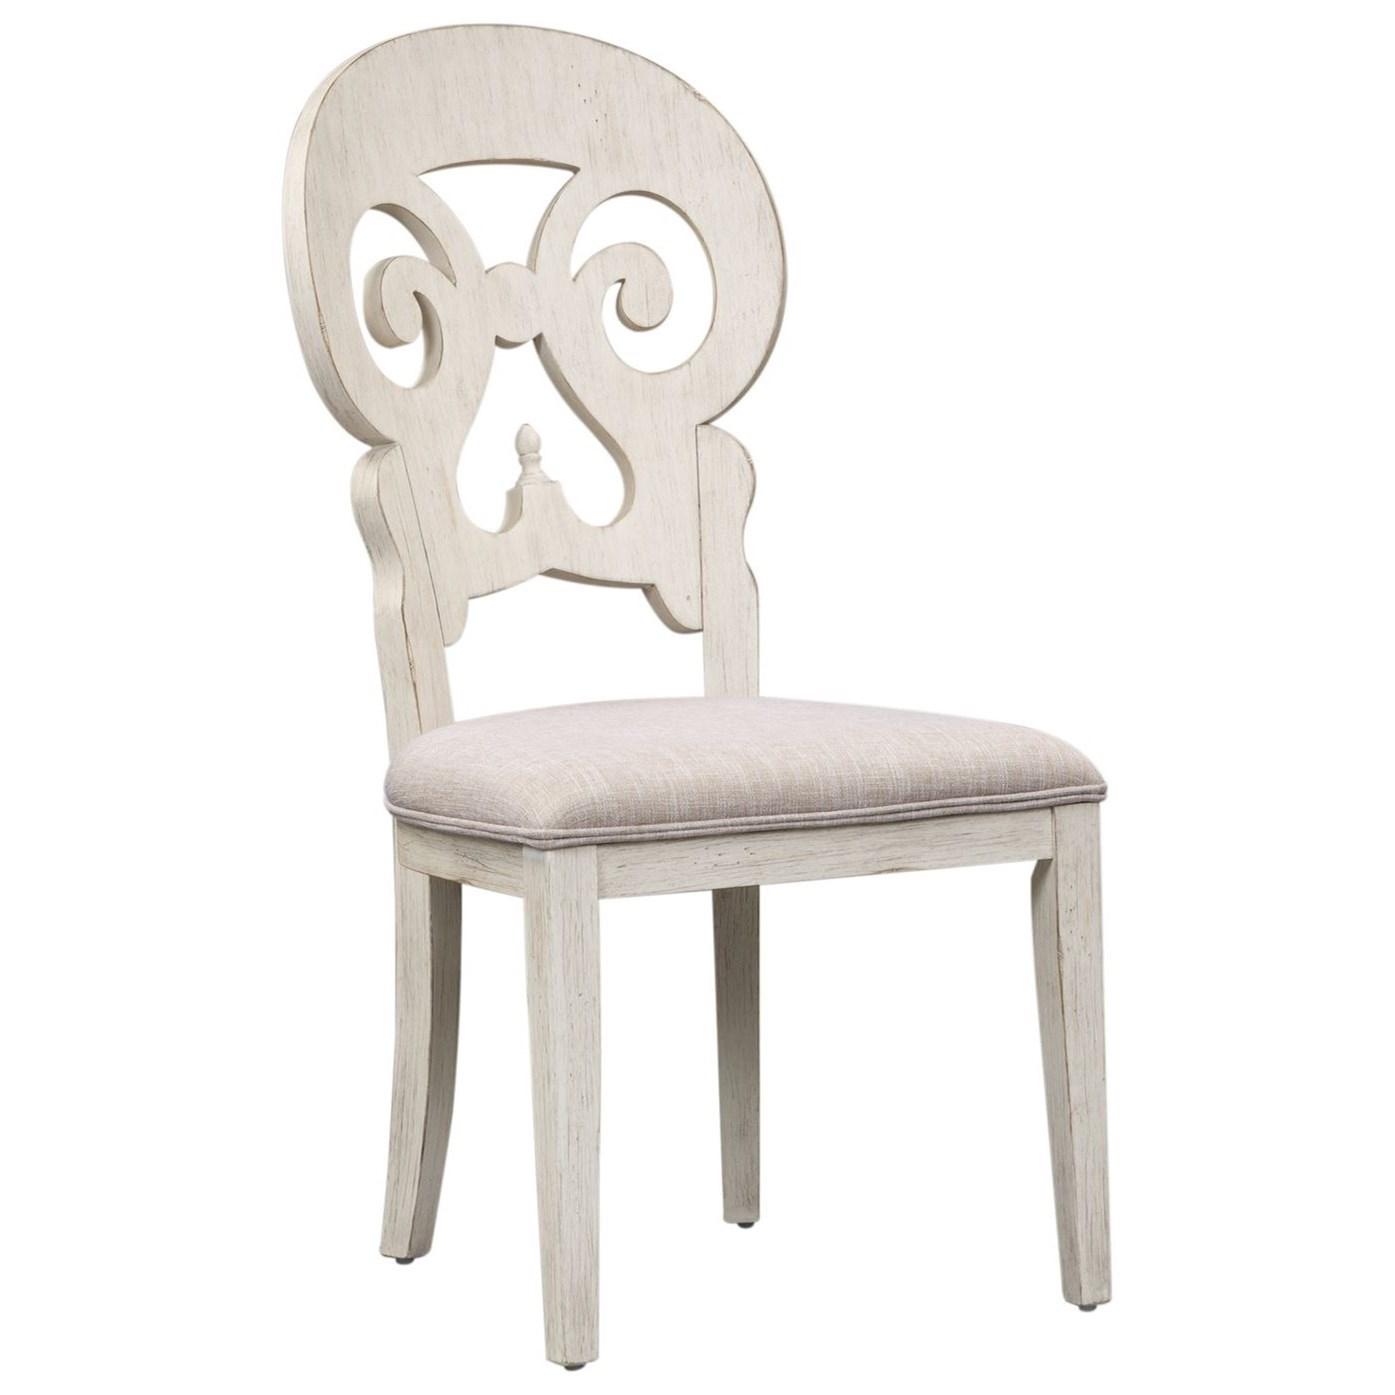 Relaxed Vintage Upholstered Splat Back Side Chair